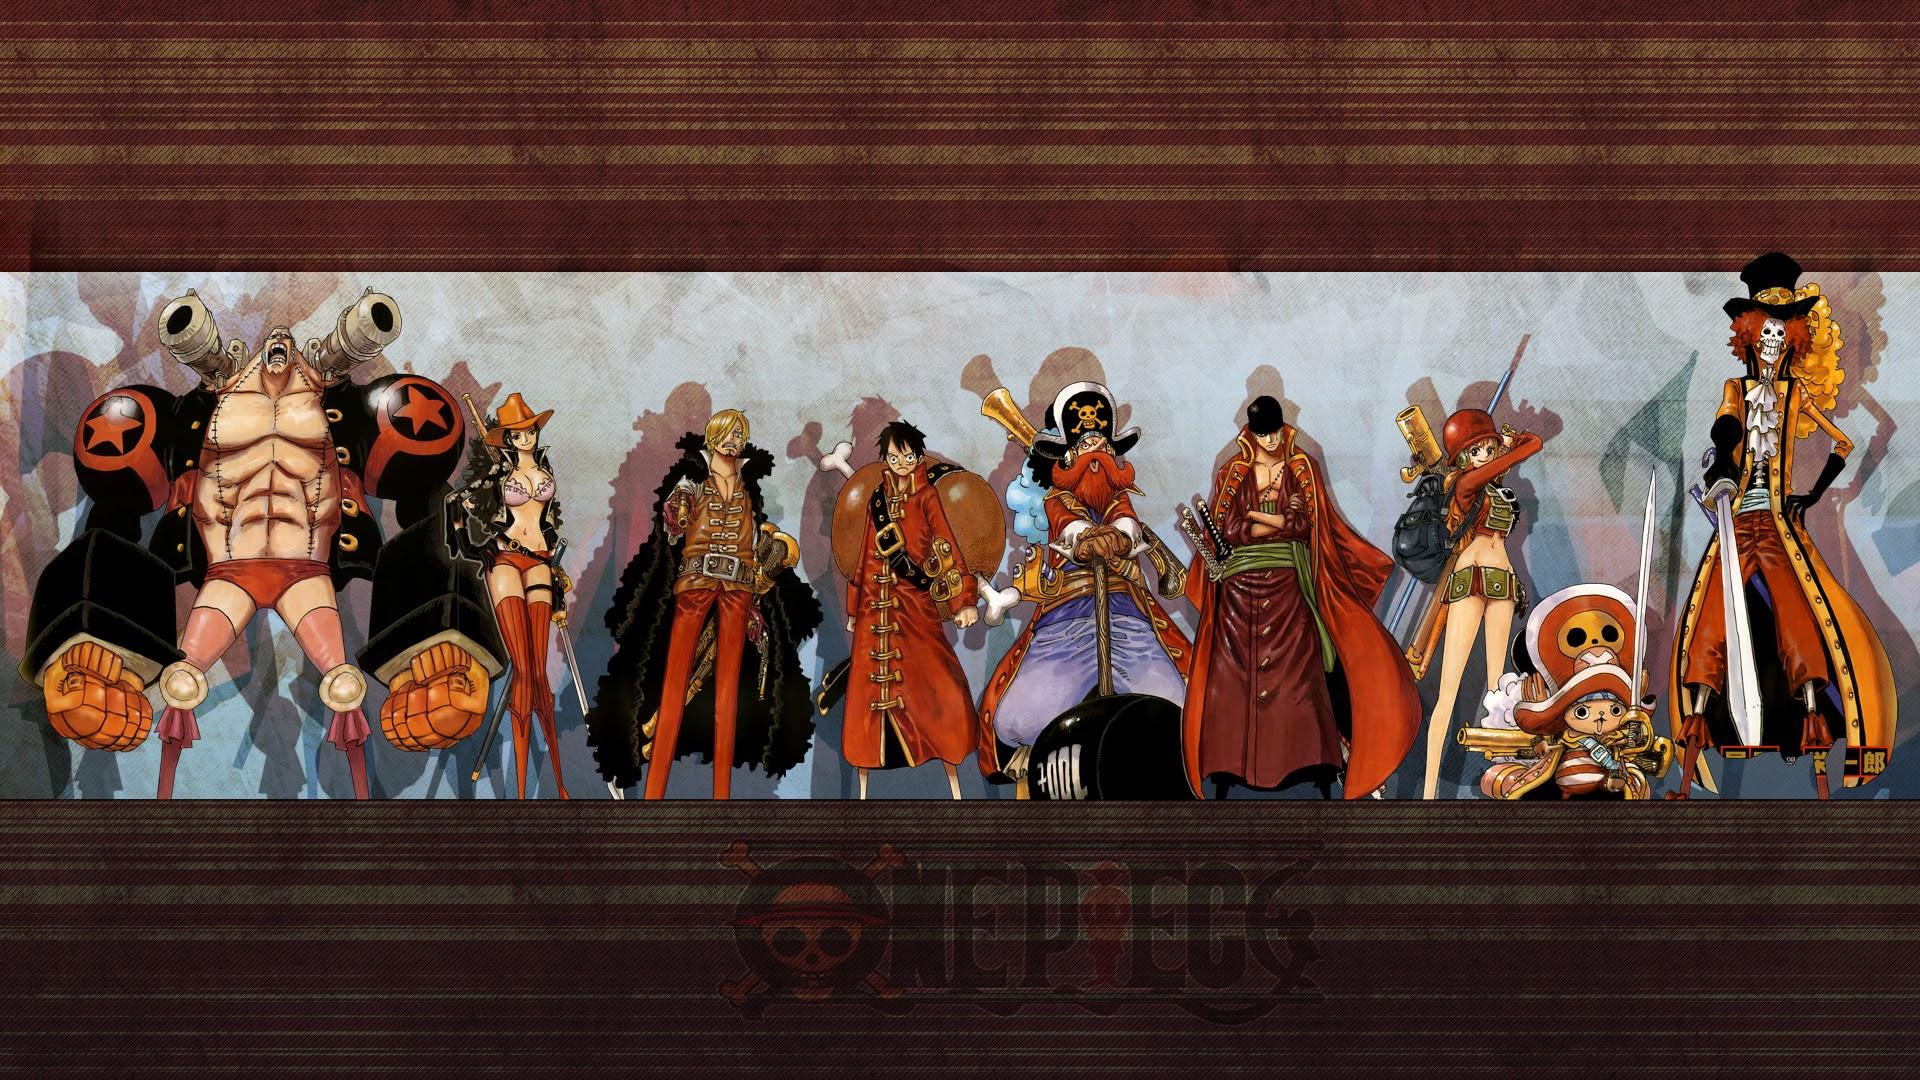 Straw hat pirates new world desktop wallpaper